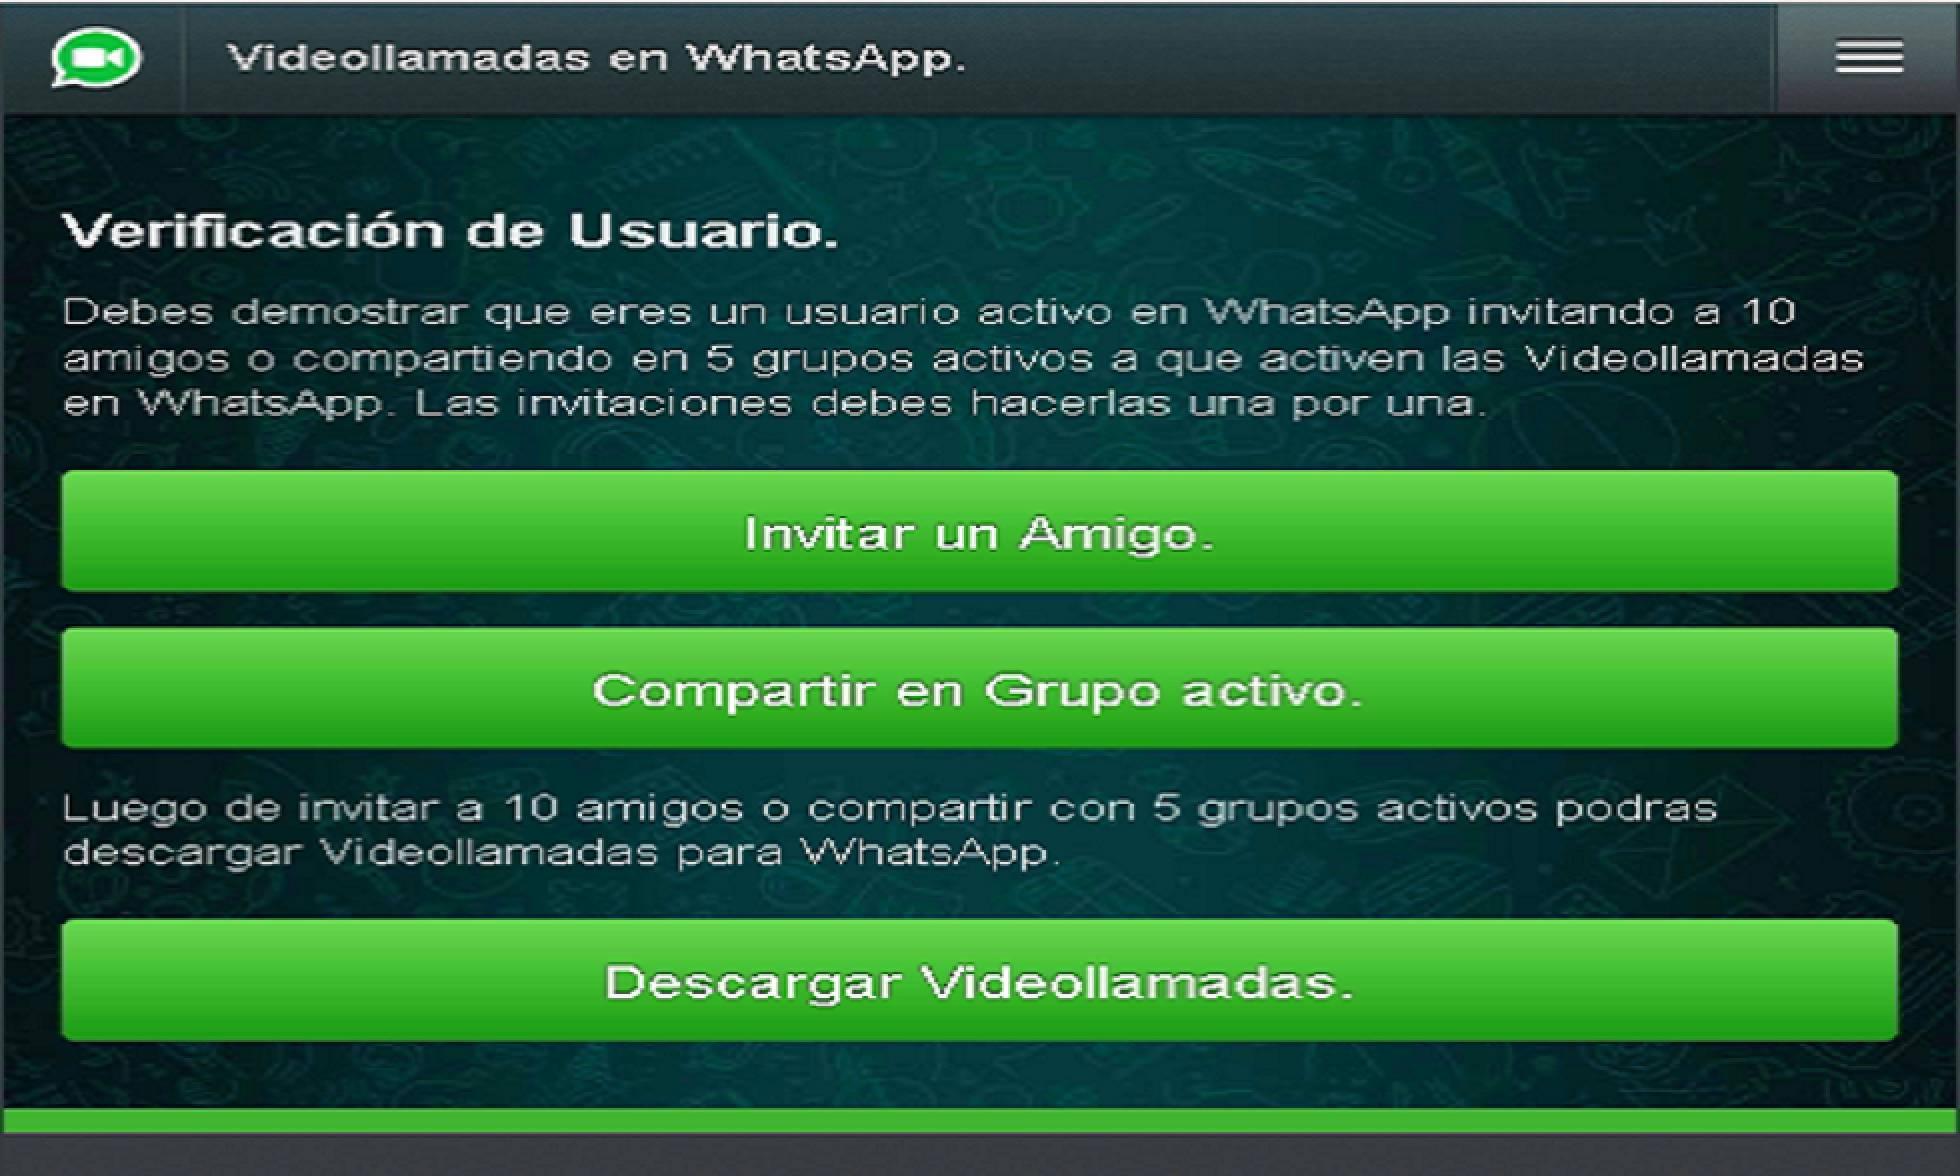 fraude con supuestas videollamadas para Whatsapp